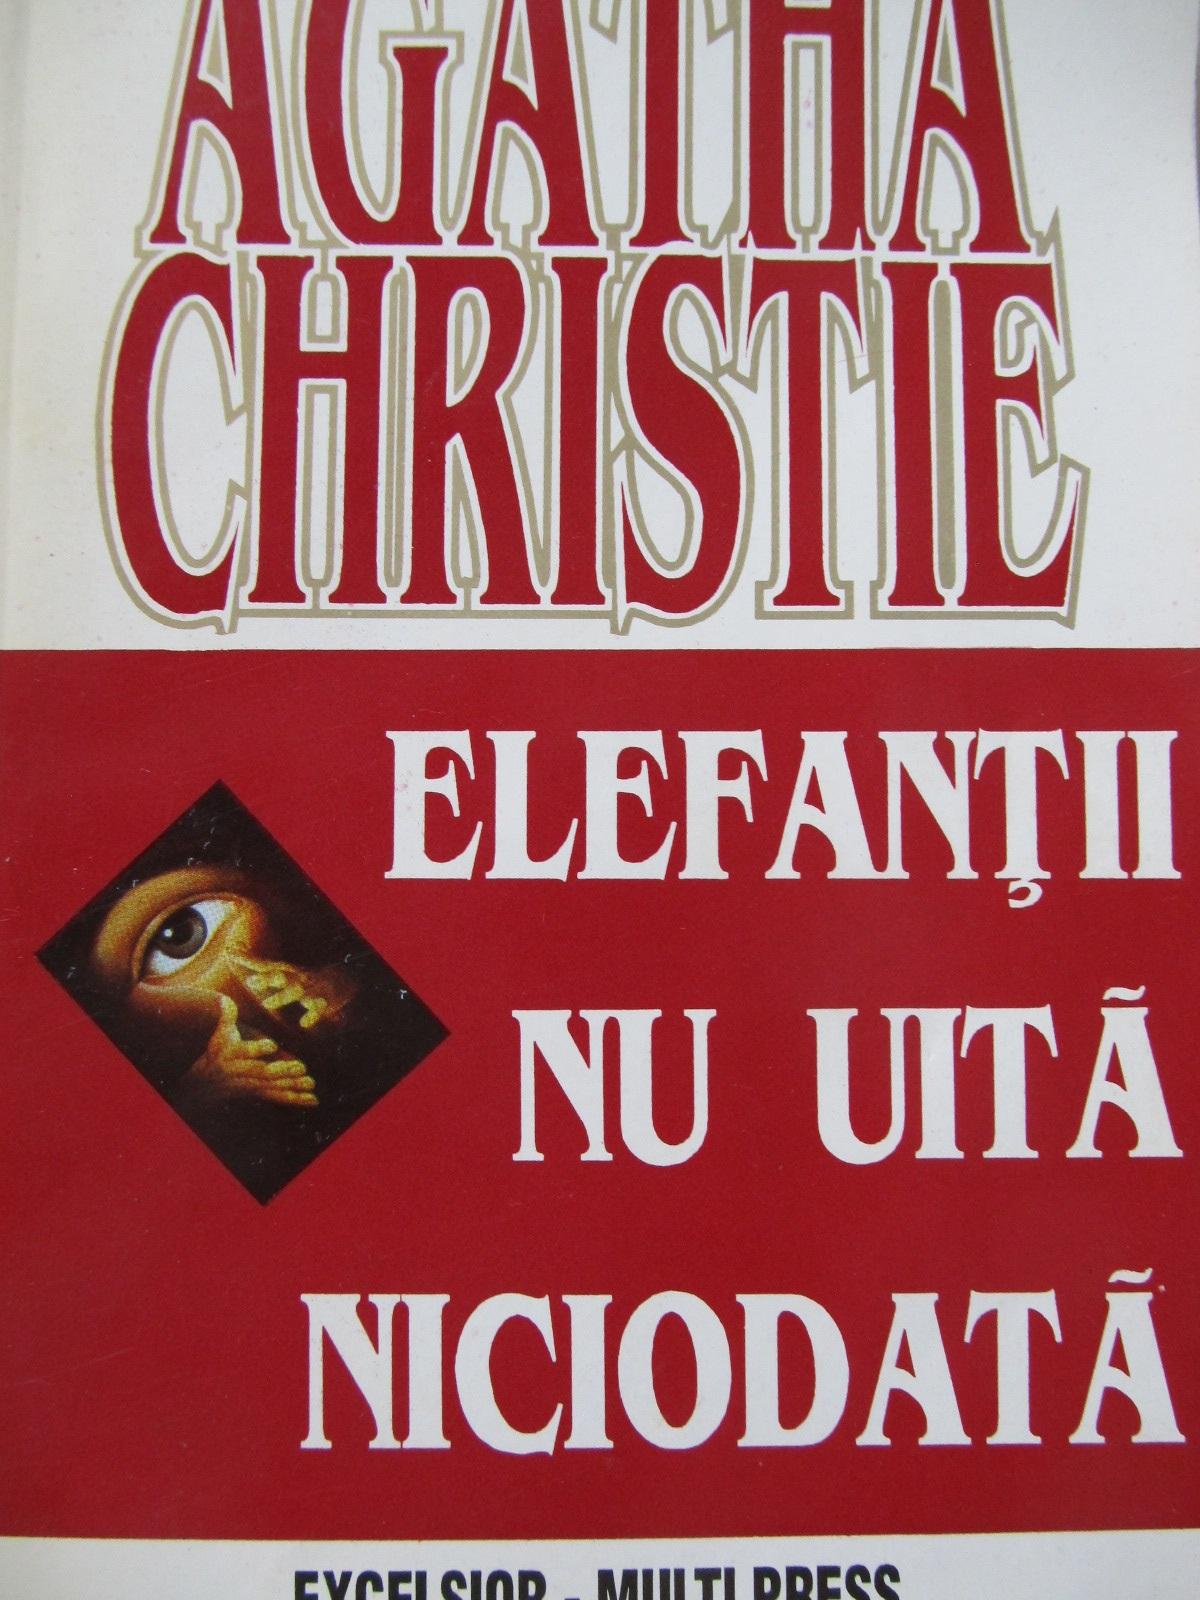 Elefantii nu uita niciodata [1] - Agatha Christie   Detalii carte